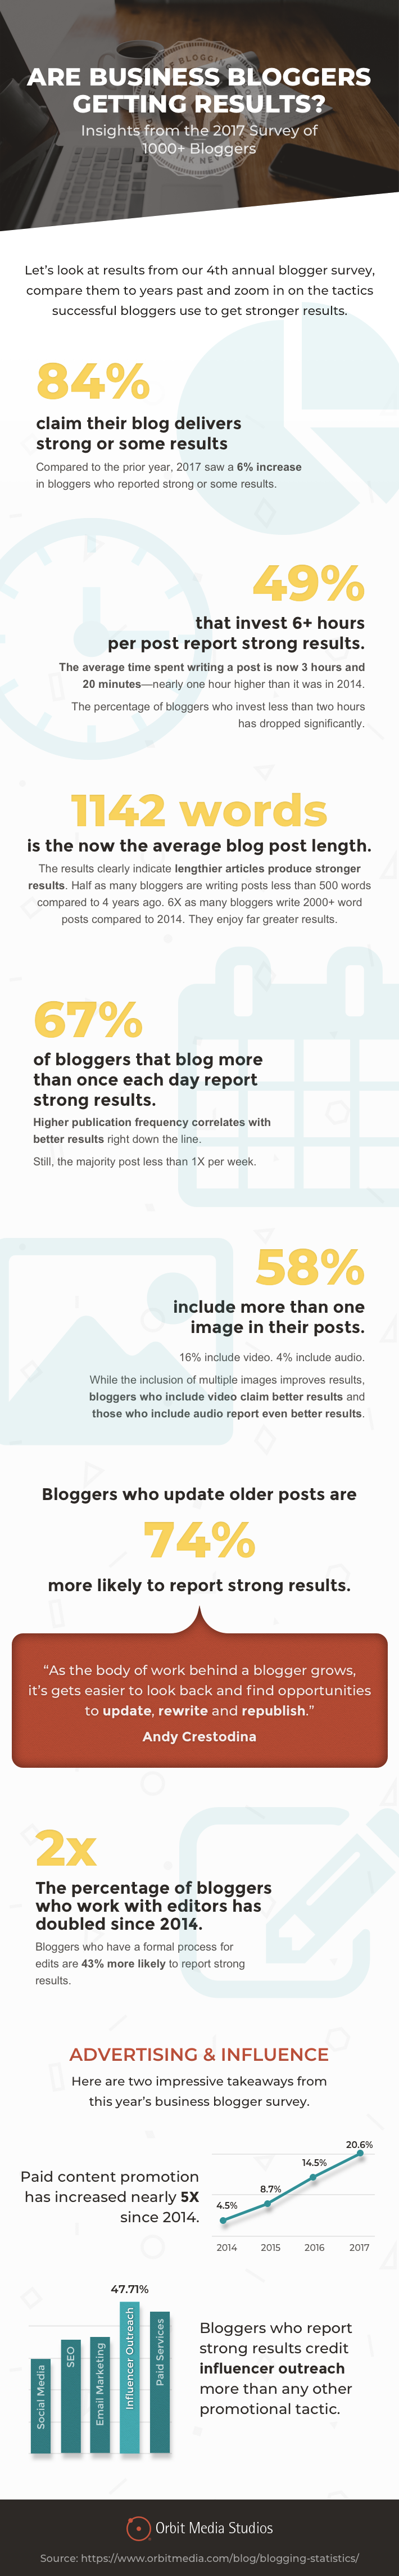 blogger-survey 2017-infographic-final.png